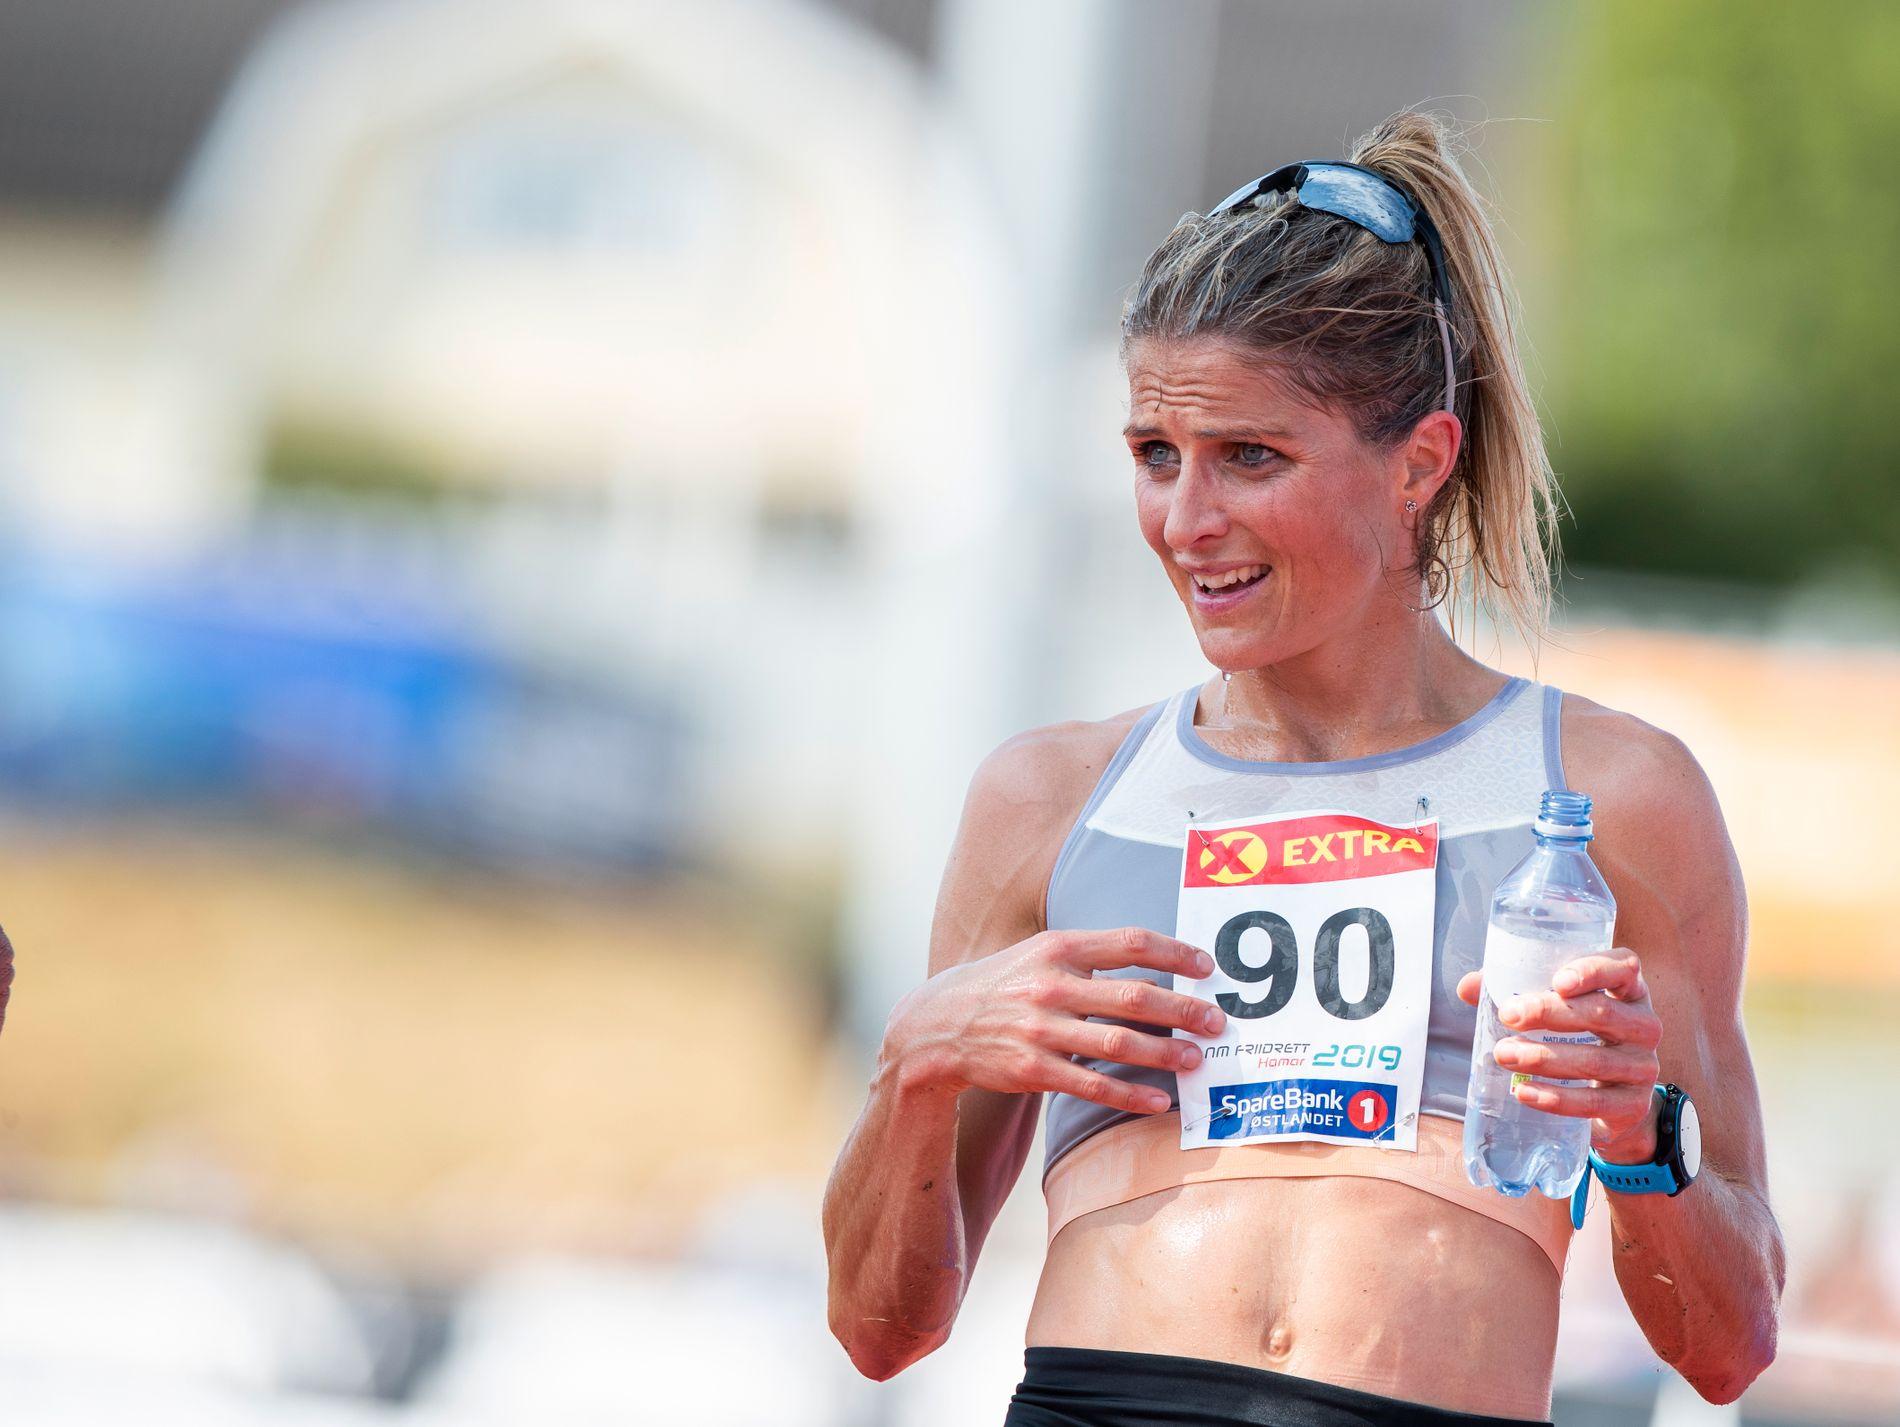 Therese Johaug vant i helgen en overlegen seier på 10.000 meter under NM.